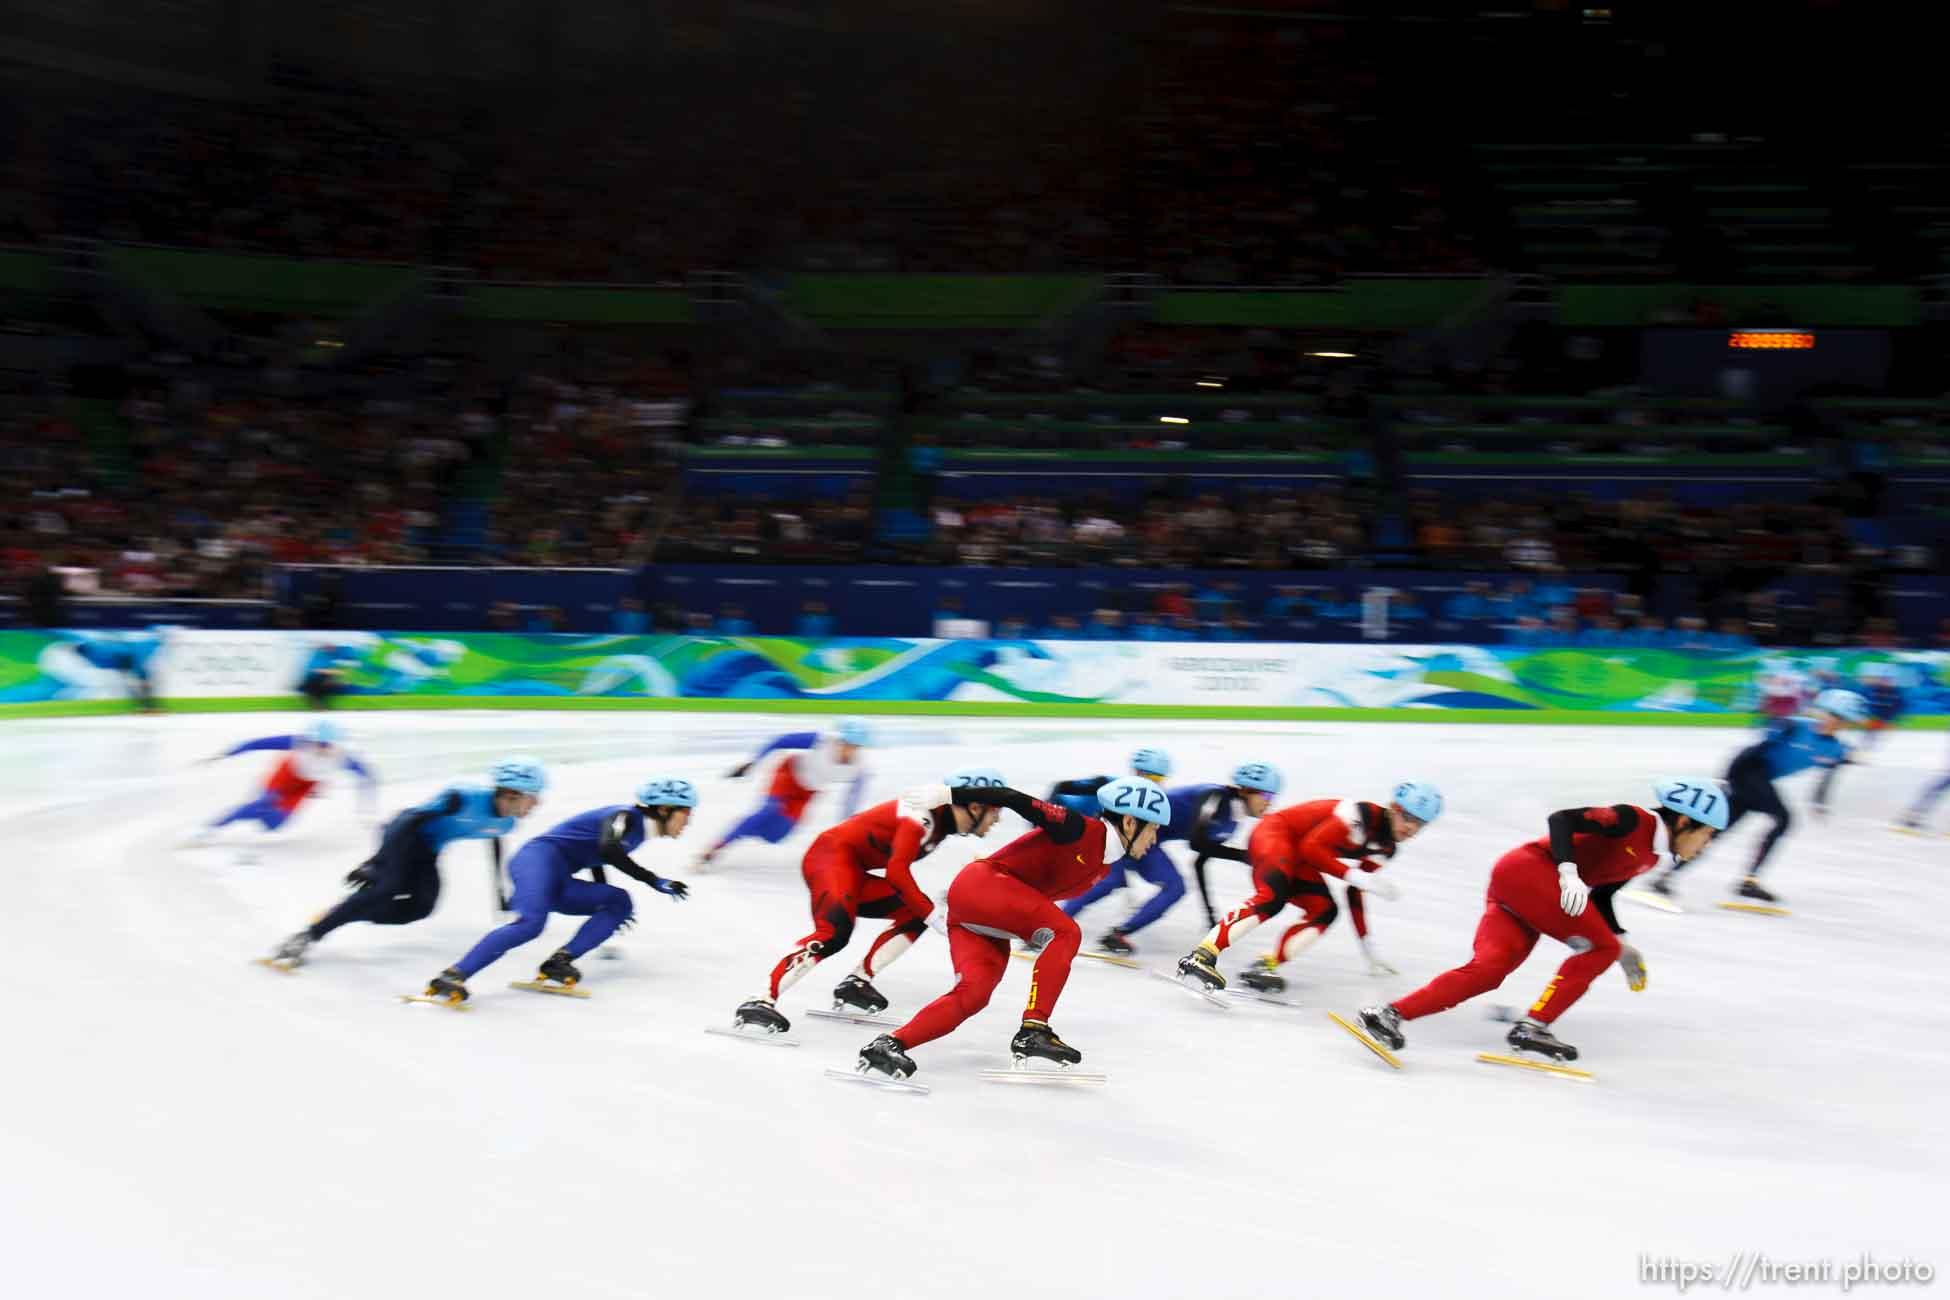 Trent Nelson | The Salt Lake Tribune Men's 5000m relay final, Short Track Speed Skating at the Pacific Coliseum Vancouver, XXI Olympic Winter Games, Friday, February 26, 2010. Canda gold (Charles Hamelin 205, Francois Hamelin 206, Olivier Jean 207, Francois-Louis Tremblay 208), Korea silver (Kwak Yoon-Gy 241, Lee Ho-Suk 242, Lee Jung-Su 243, Sung Si-Bak 244), USA bronze (J.R. Celski 252, Travis Jayner 254, Jordan Malone 255, Apolo Anton Ohno 256).